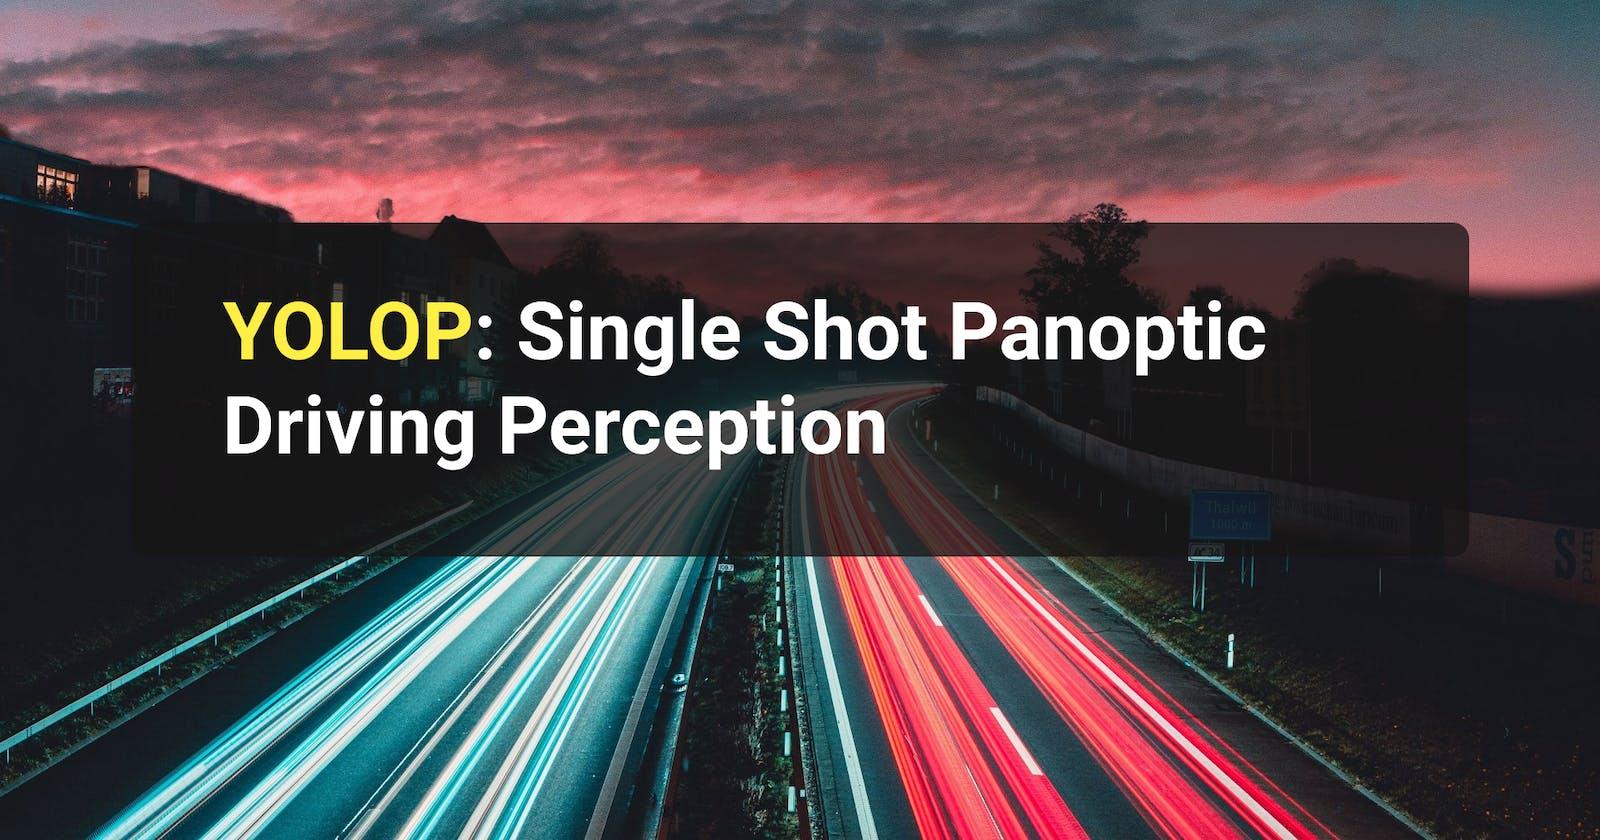 YOLOP: Single Shot Panoptic Driving Perception